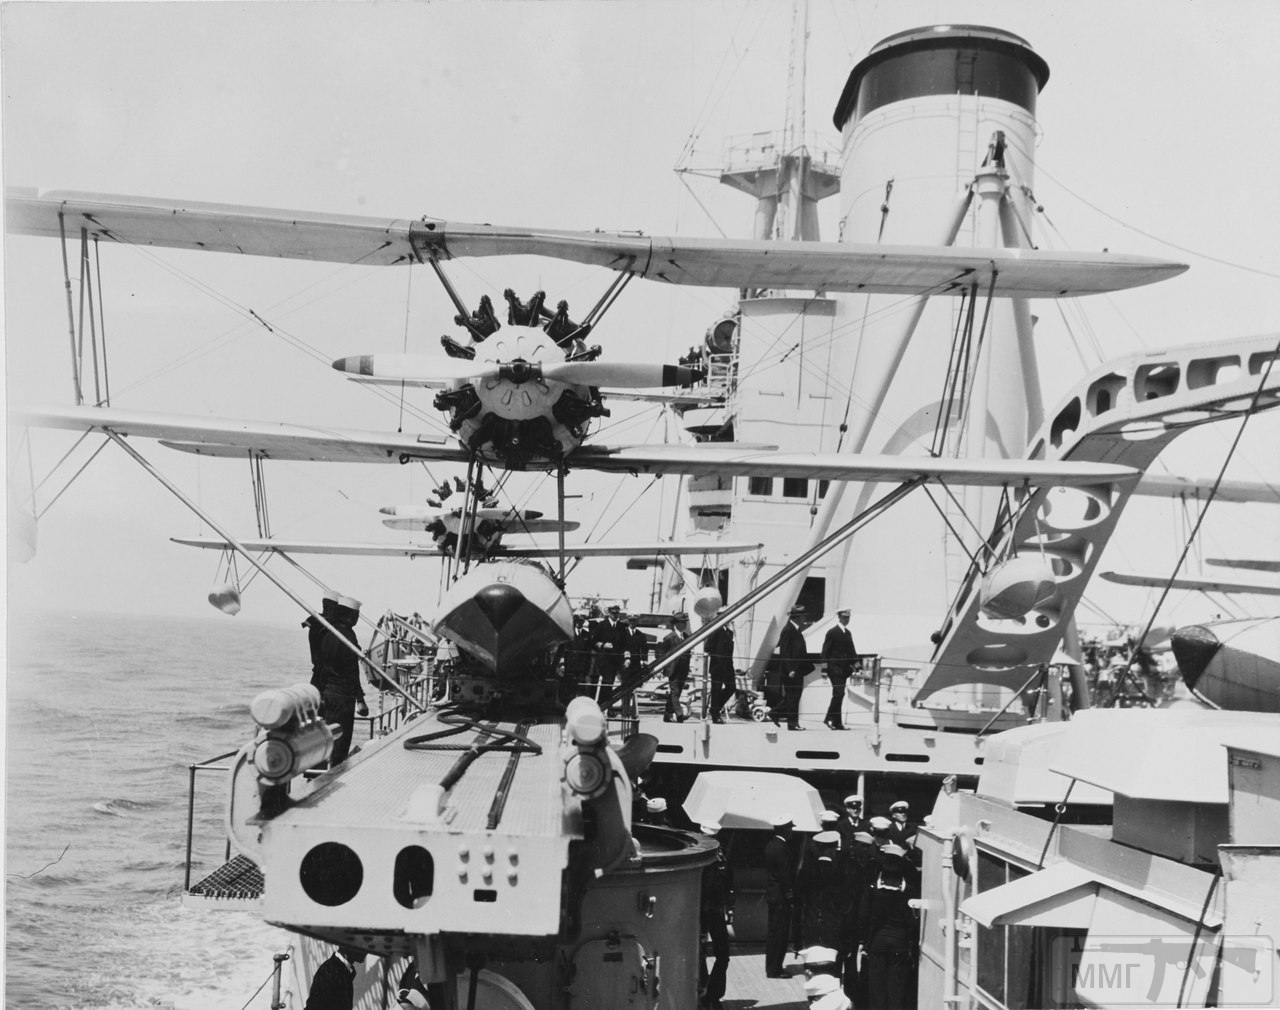 23950 - USS Salt Lake City (CA-25)